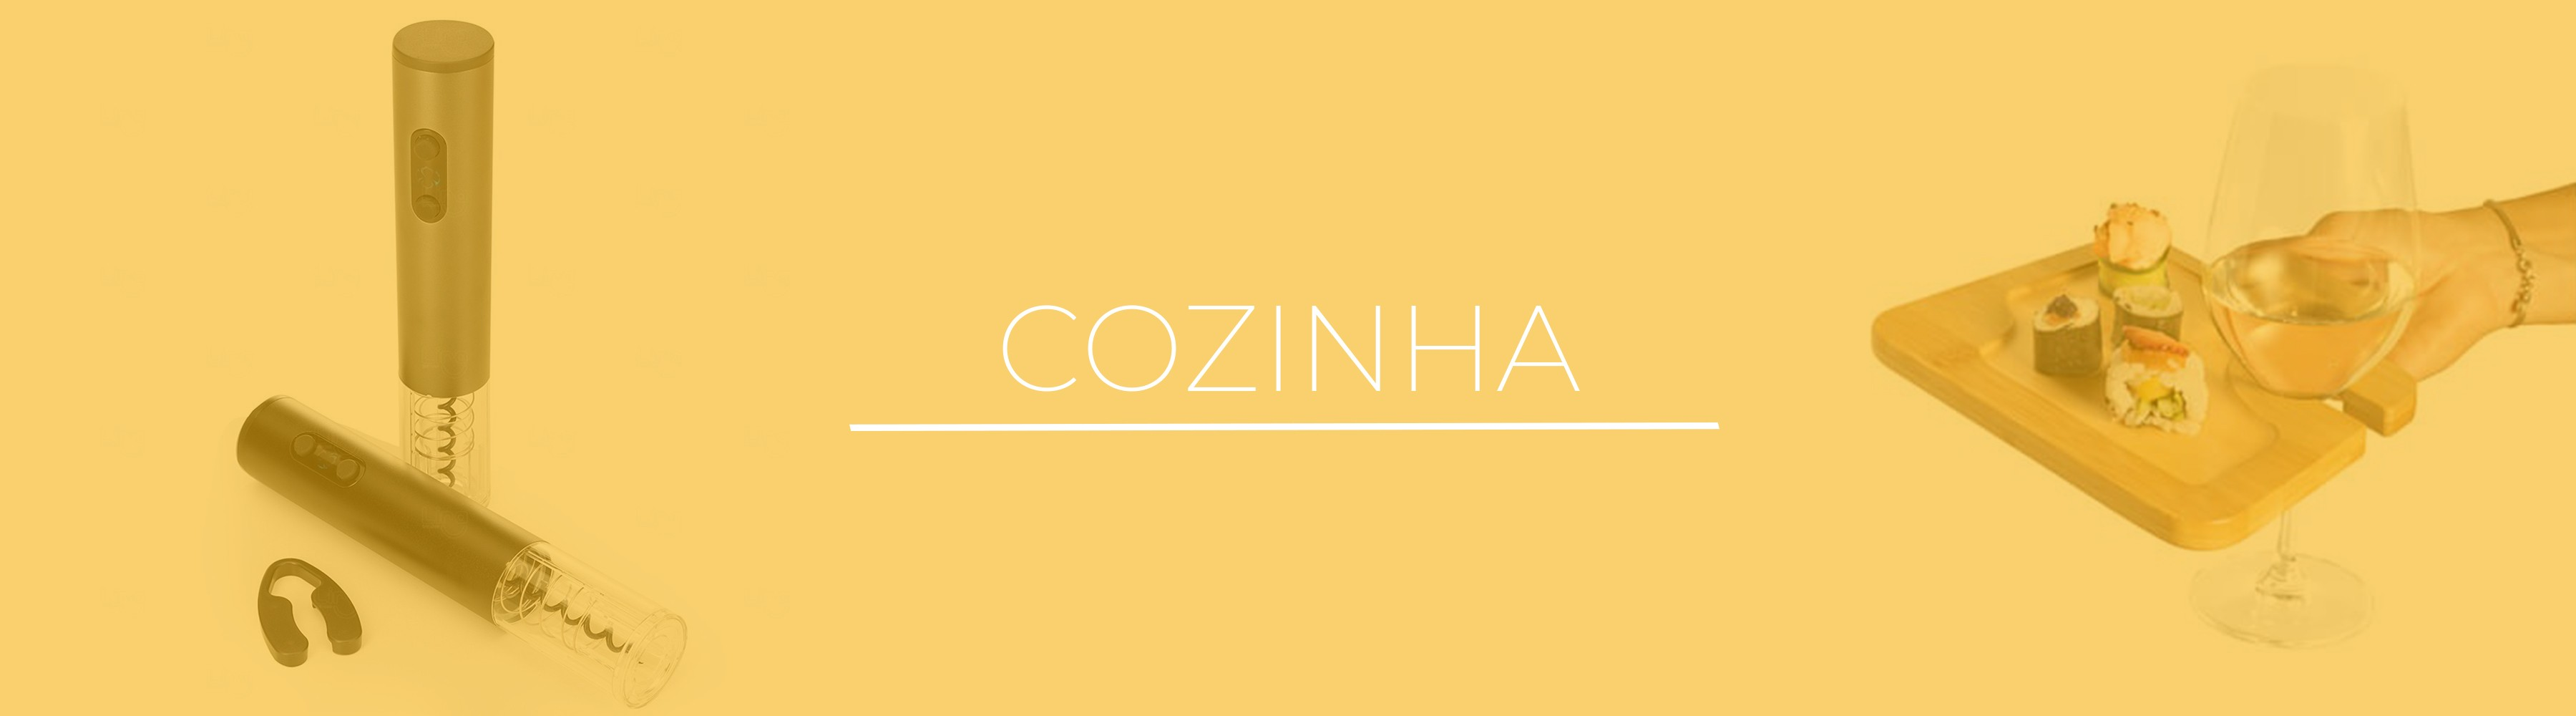 Banner Cozinha